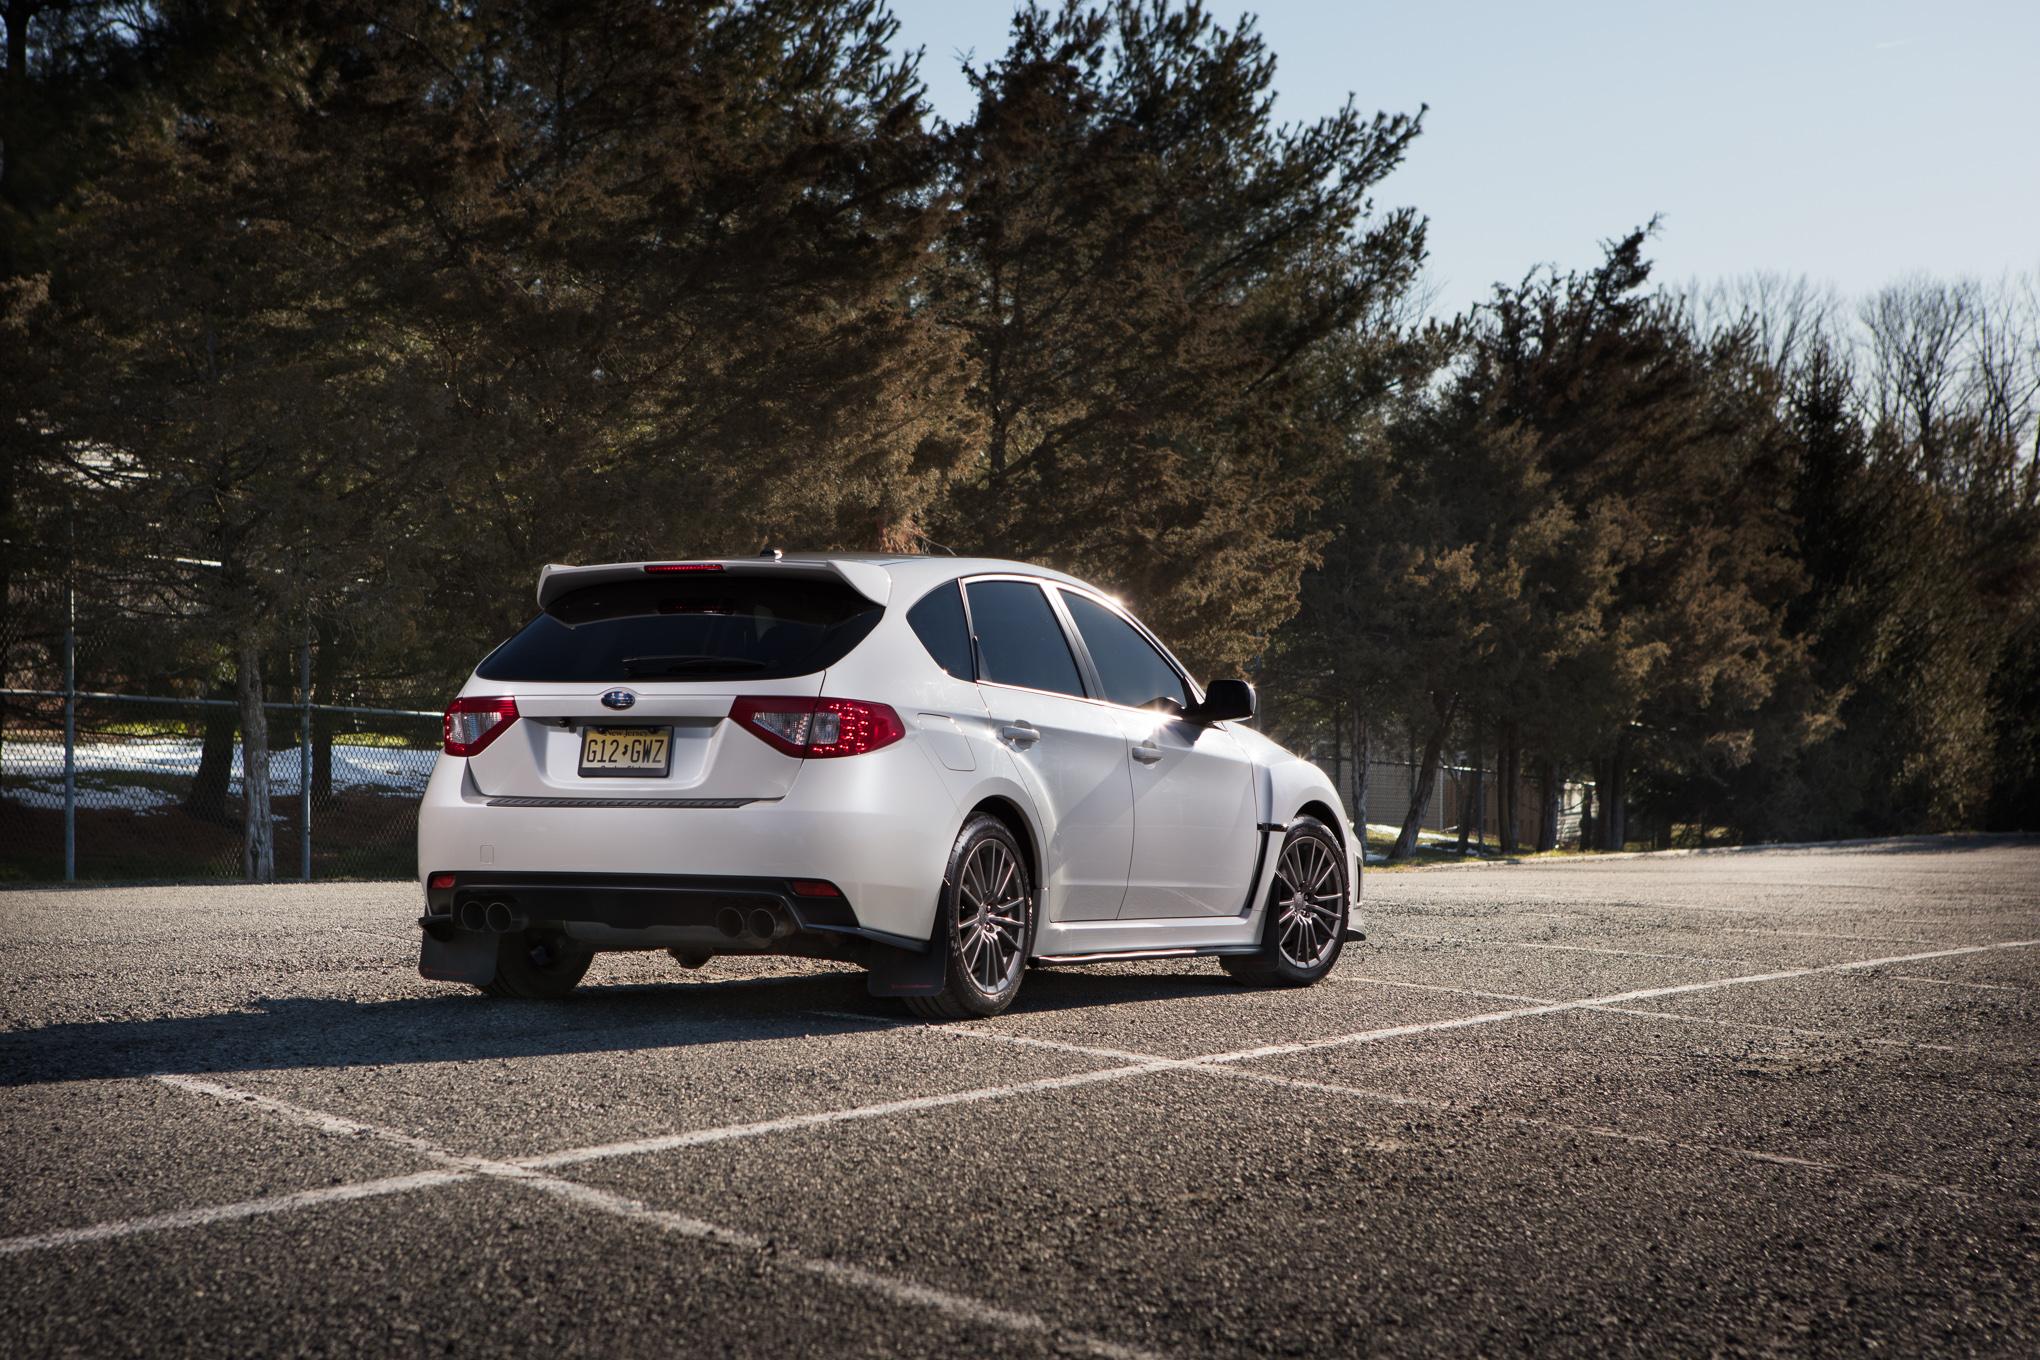 2013 Subaru WRX Hatchback, SWP-2013-subaru-wrx-0063-web-jpg